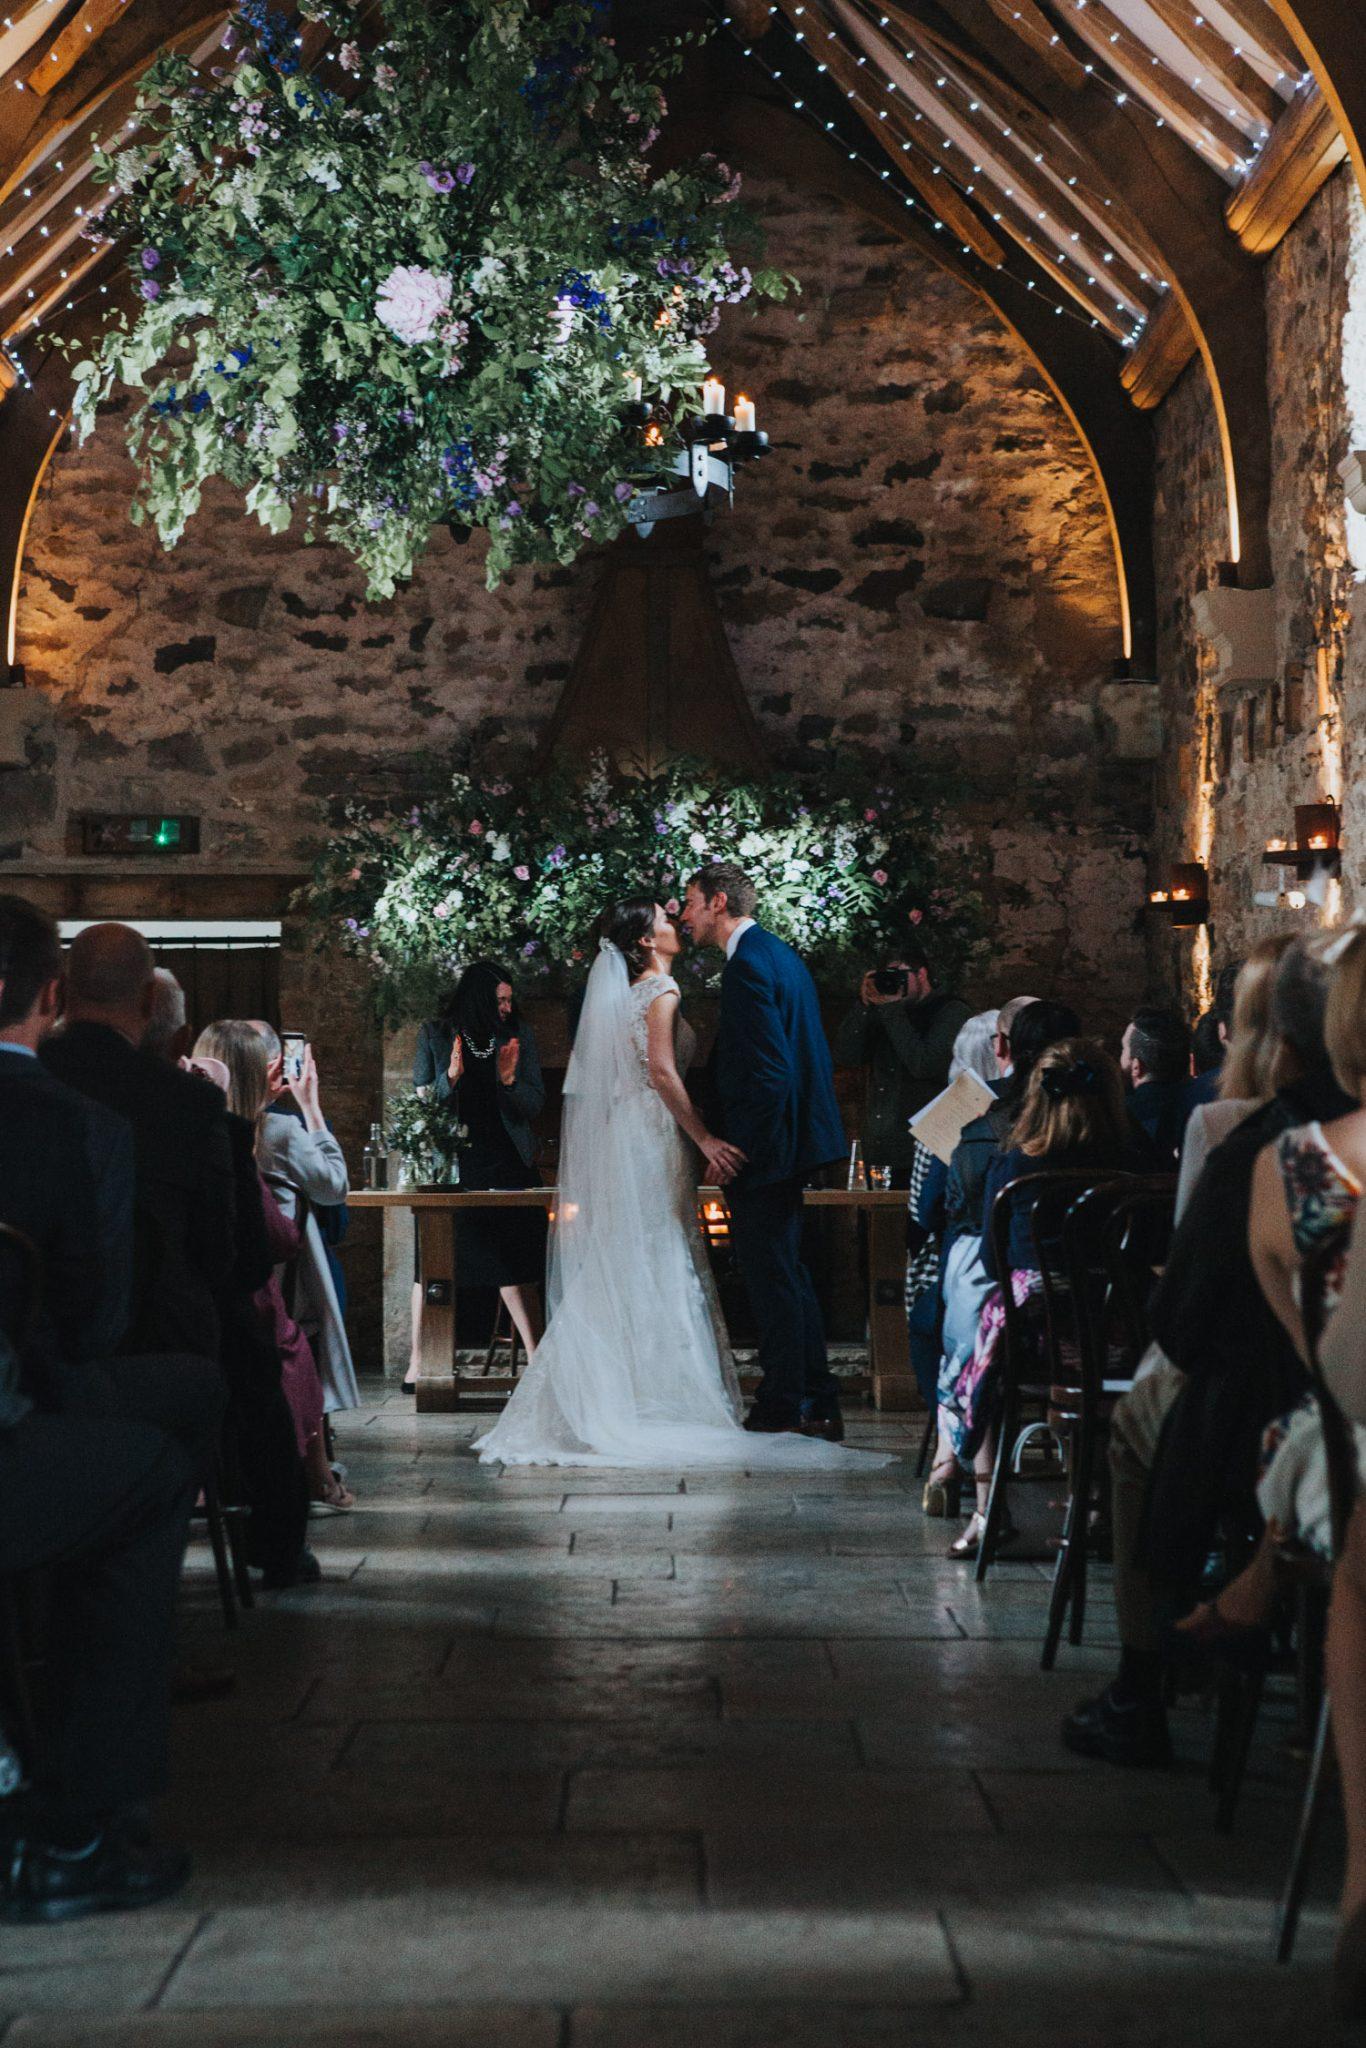 Healey Barn Wedding - Liz & Daniel (1 of 3)